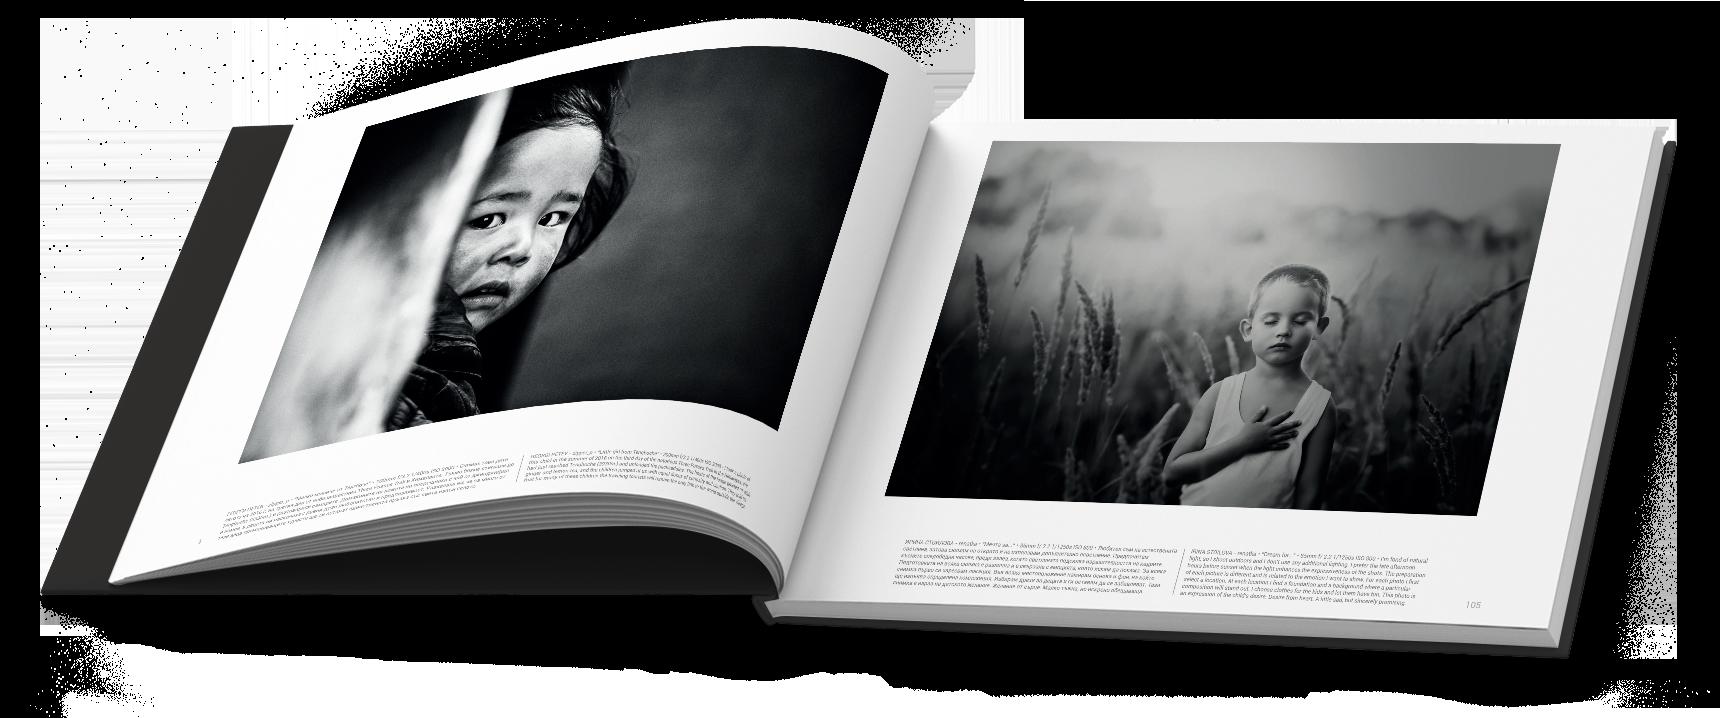 Фотографски Албум 2018 г. - Black&White &Color - страници 104-105